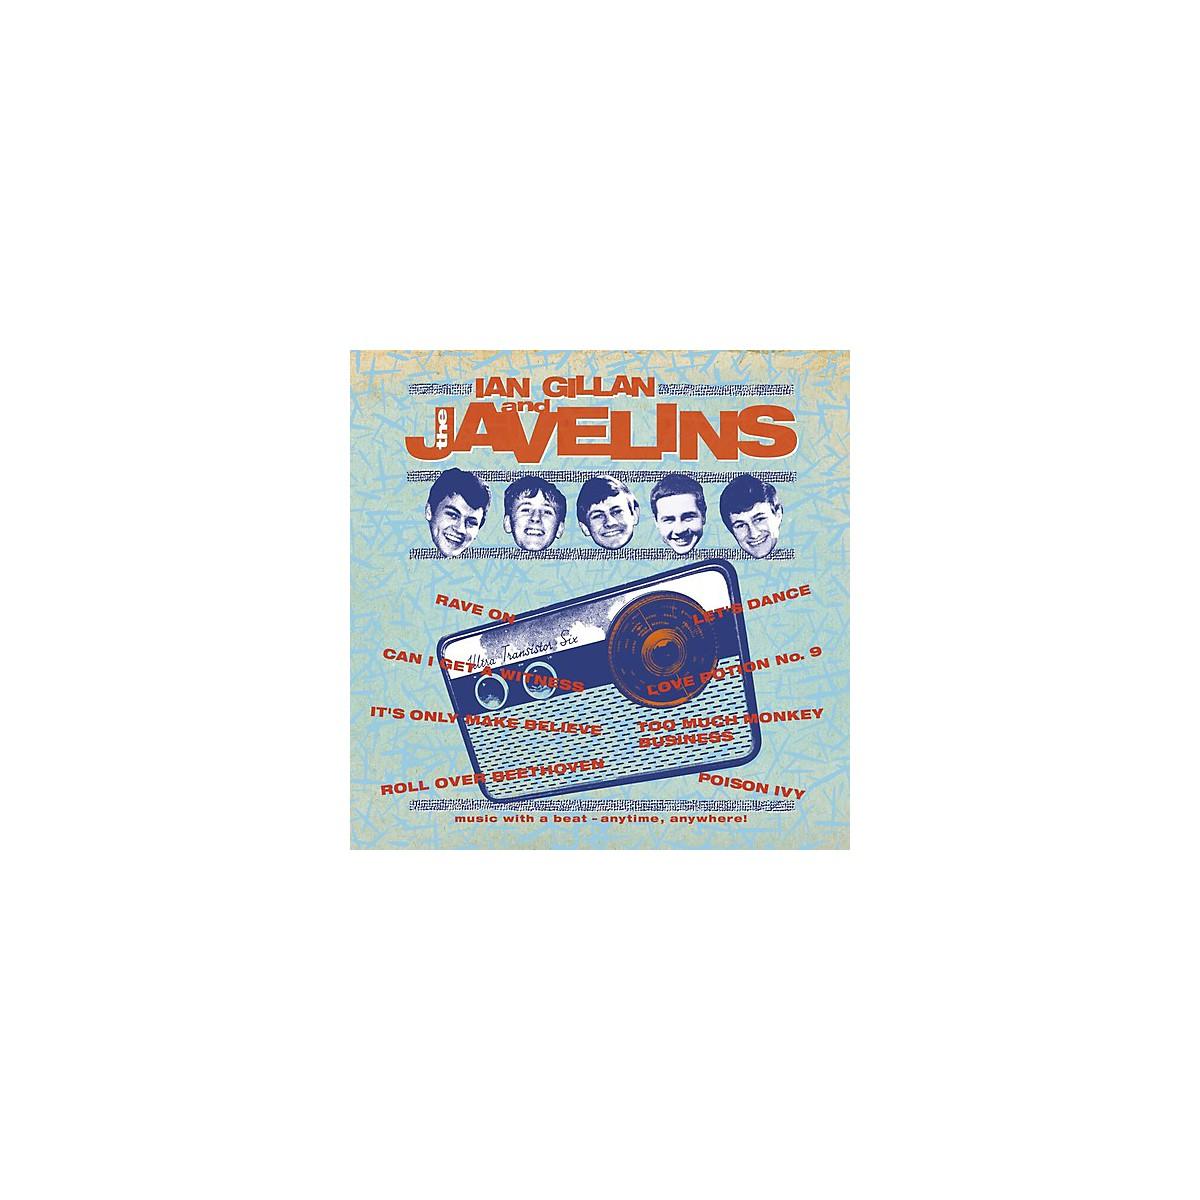 Alliance Ian Gillan - Raving With Ian Gillan & The Javelins